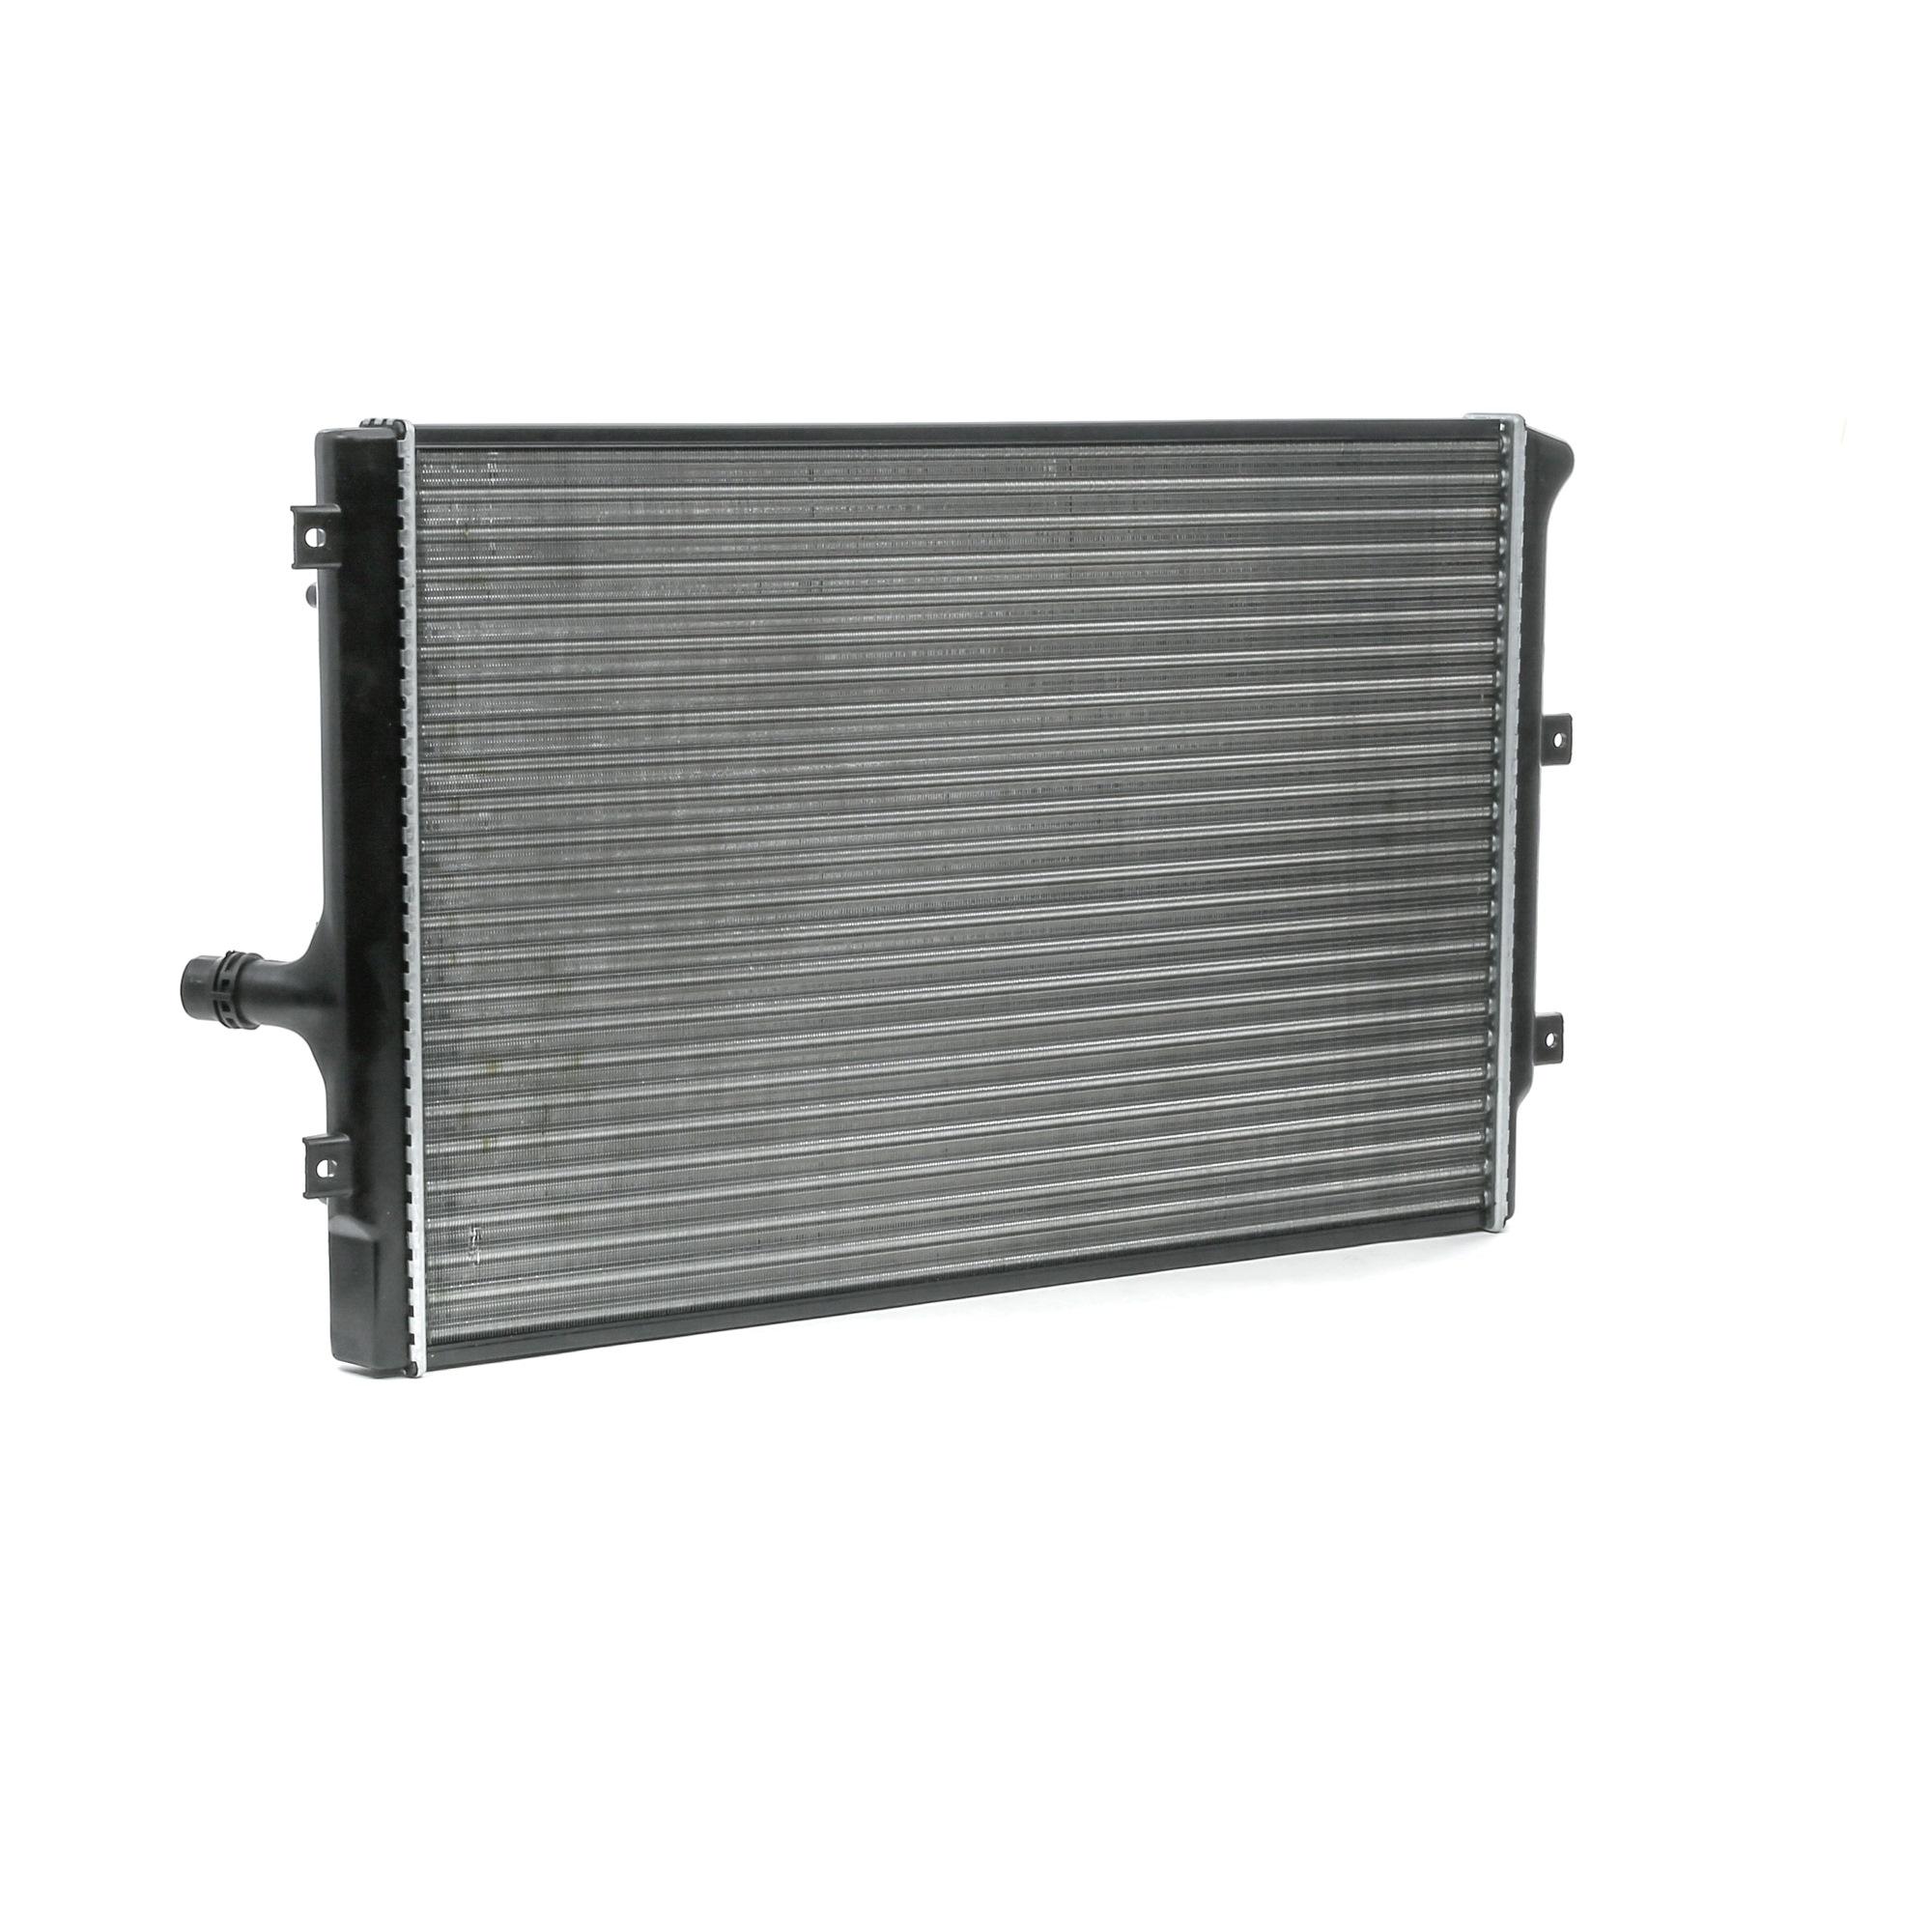 Kühler MAXGEAR AC221021 Bewertung